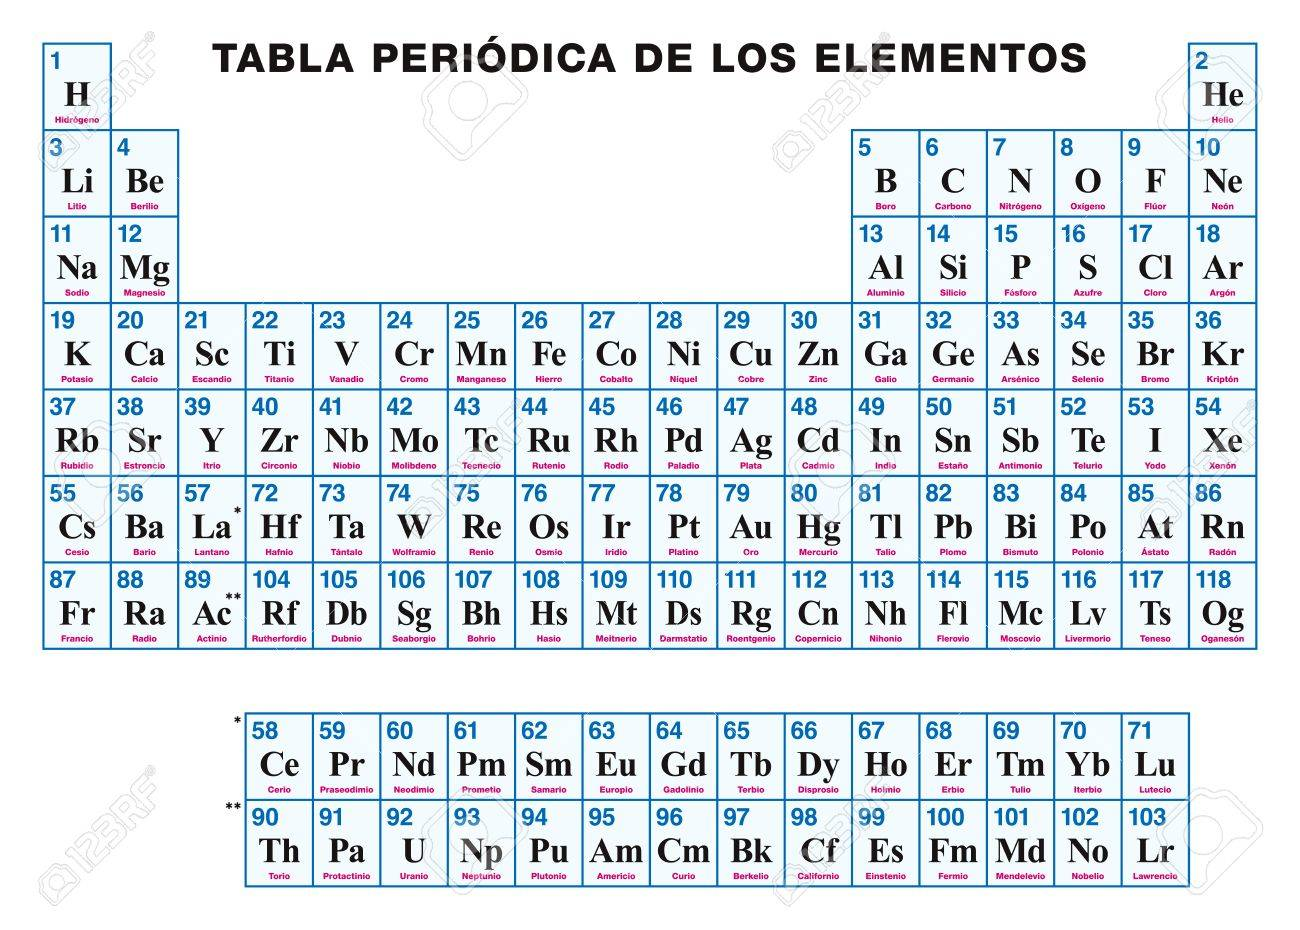 Periodic table of the elements spanish tabular arrangement periodic table of the elements spanish tabular arrangement of the chemical elements with their urtaz Choice Image